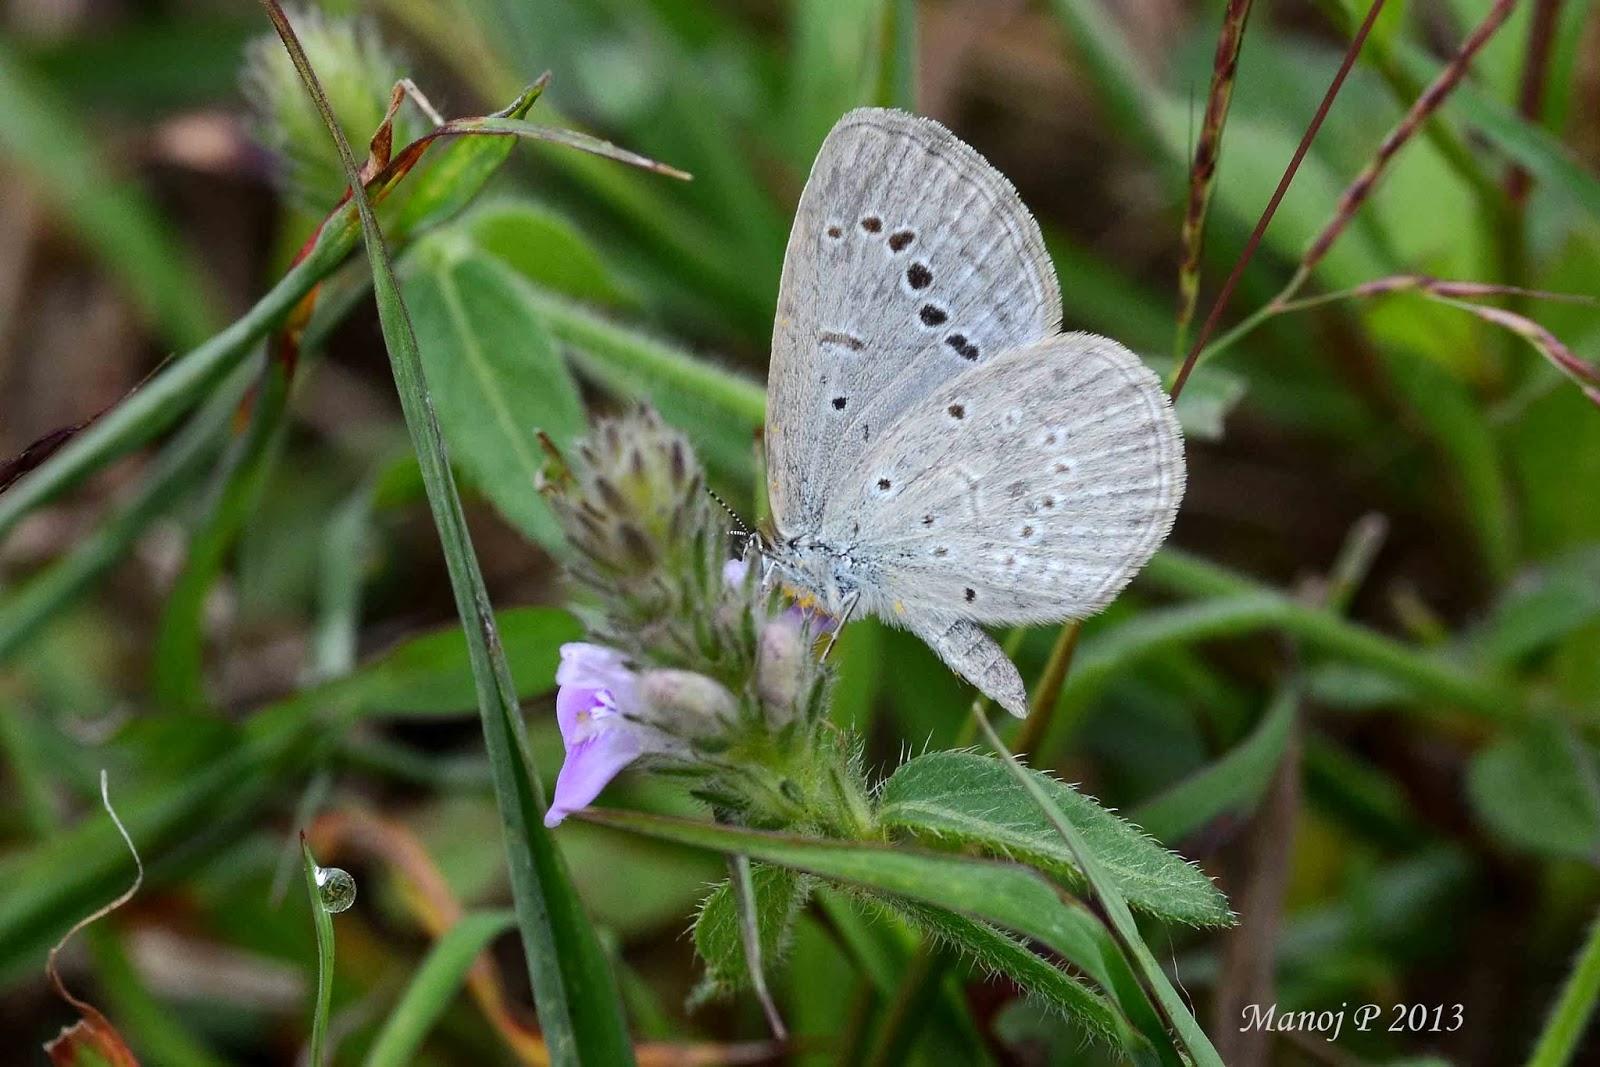 Pale Grass Blue - Pseudozizeeria maha Kollar